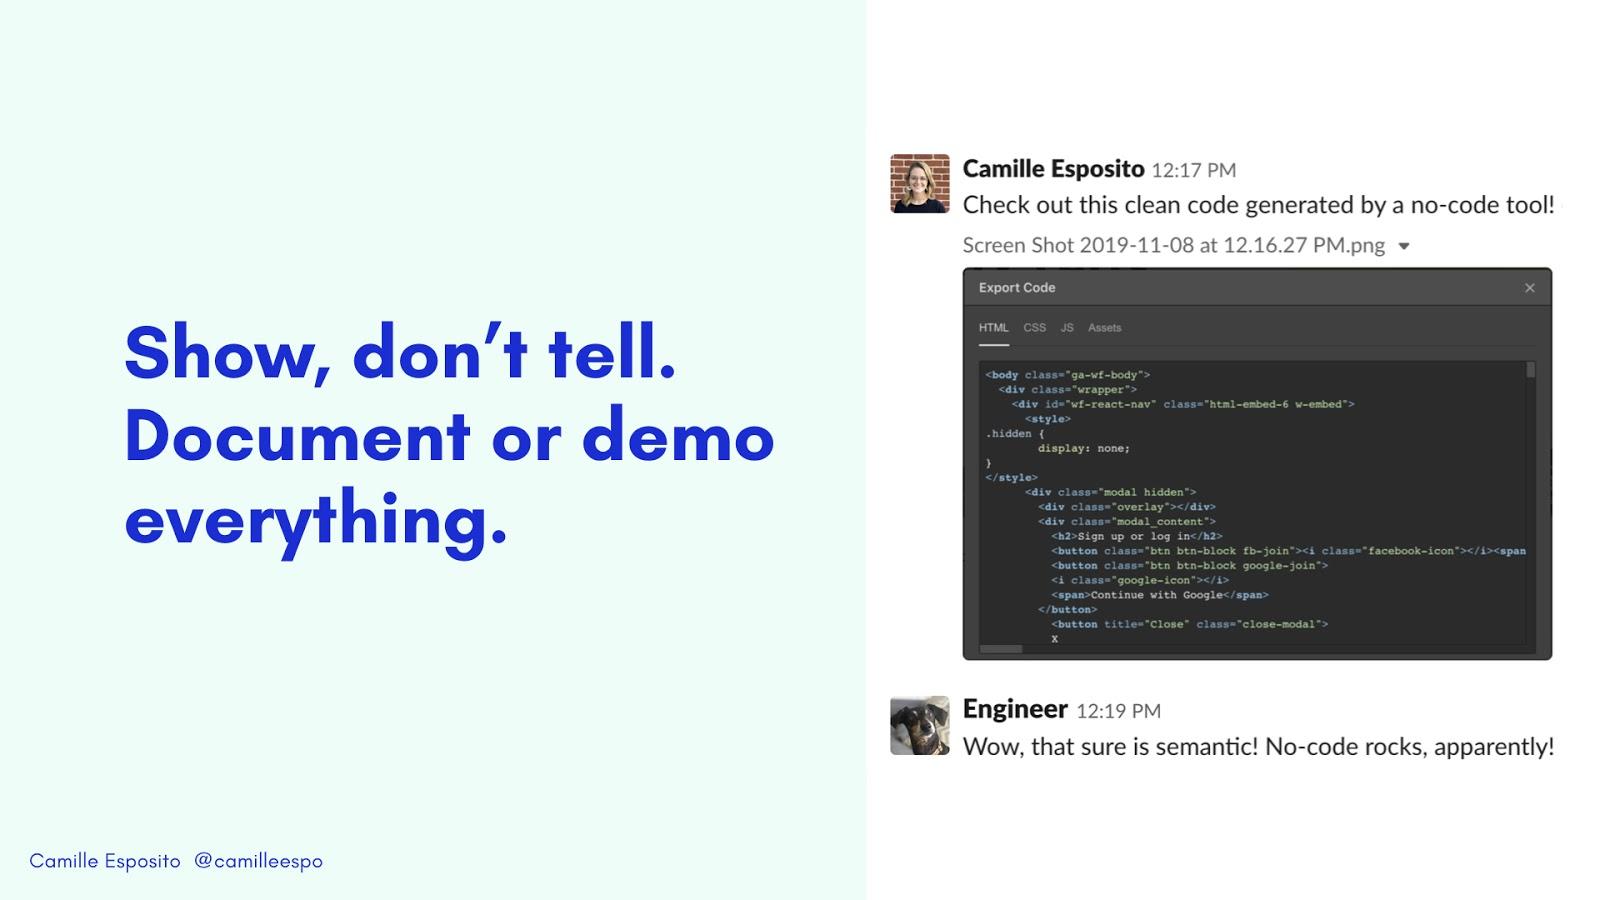 webflow creates clean code